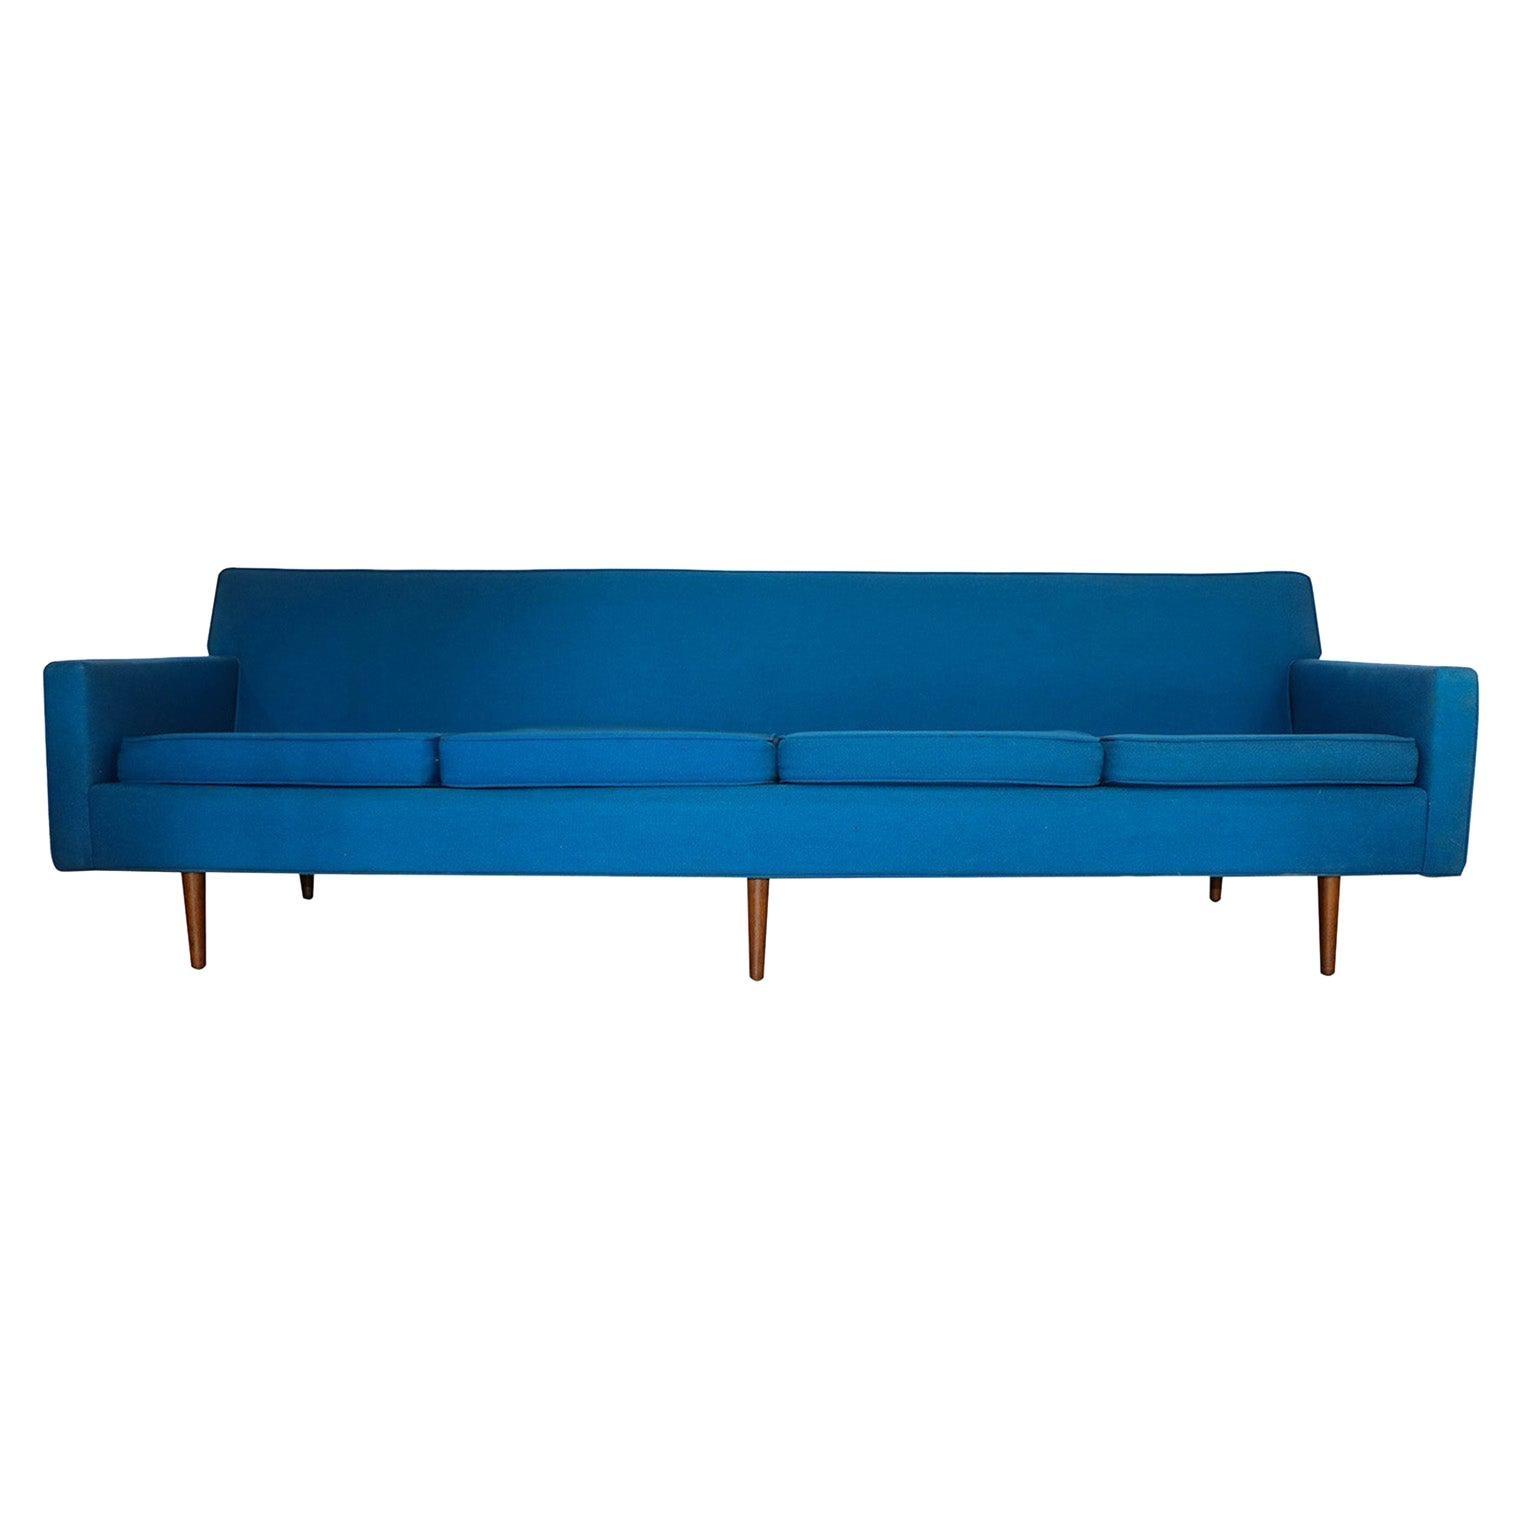 Milo Baughman for Thayer Coggin Mid-Century Modern Sofa